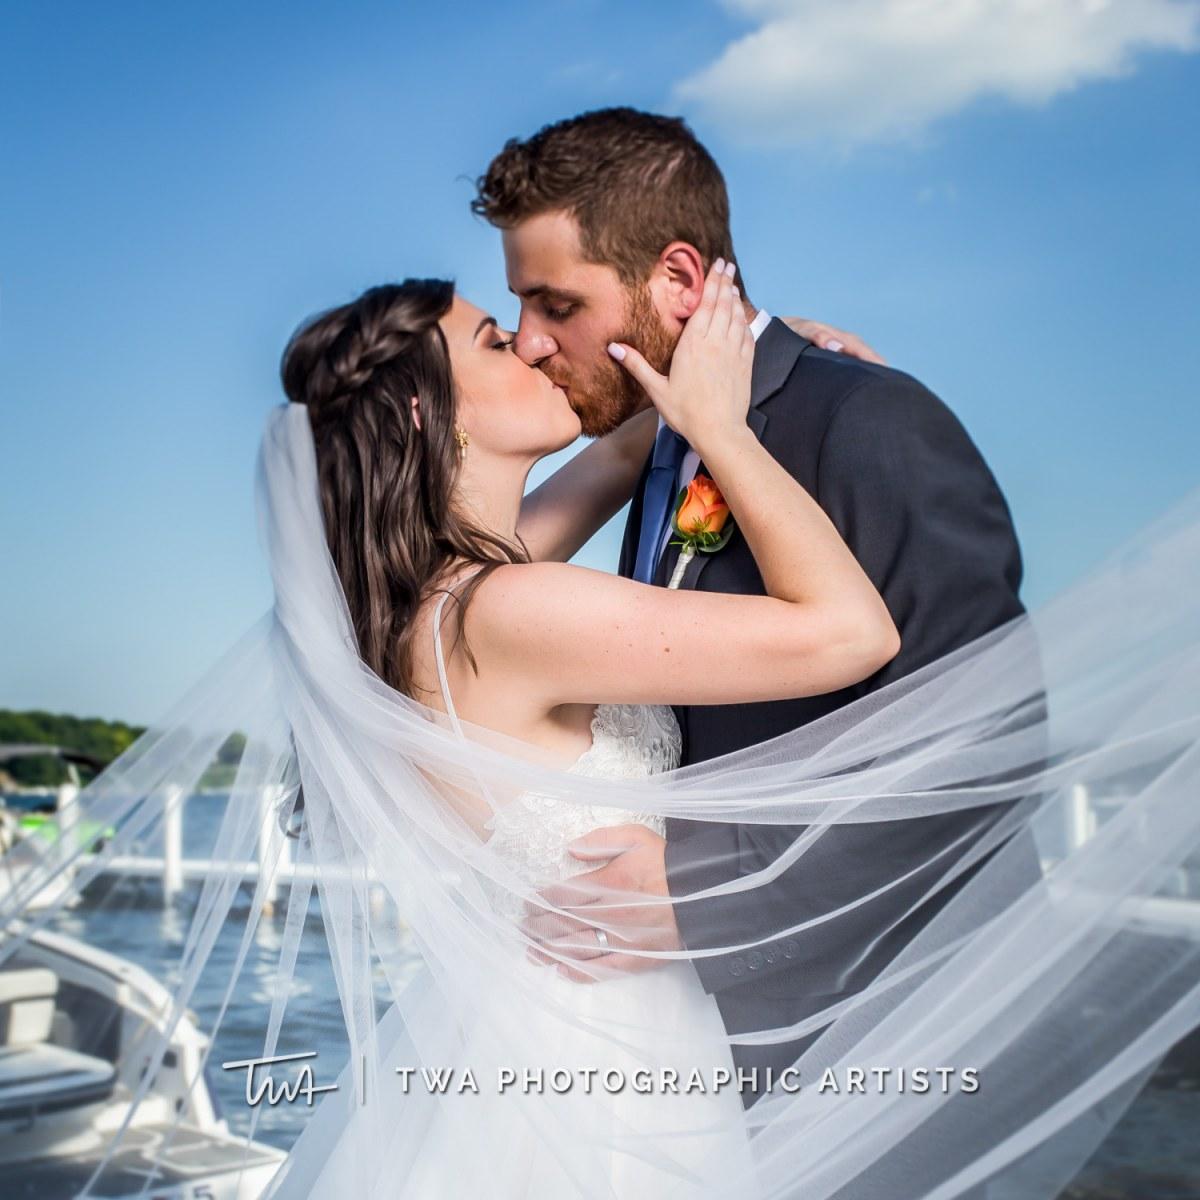 Chicago-Wedding-Photographer-TWA-Photographic-Artists-Pier-290_Swiatek_Castro_SG-075_0320